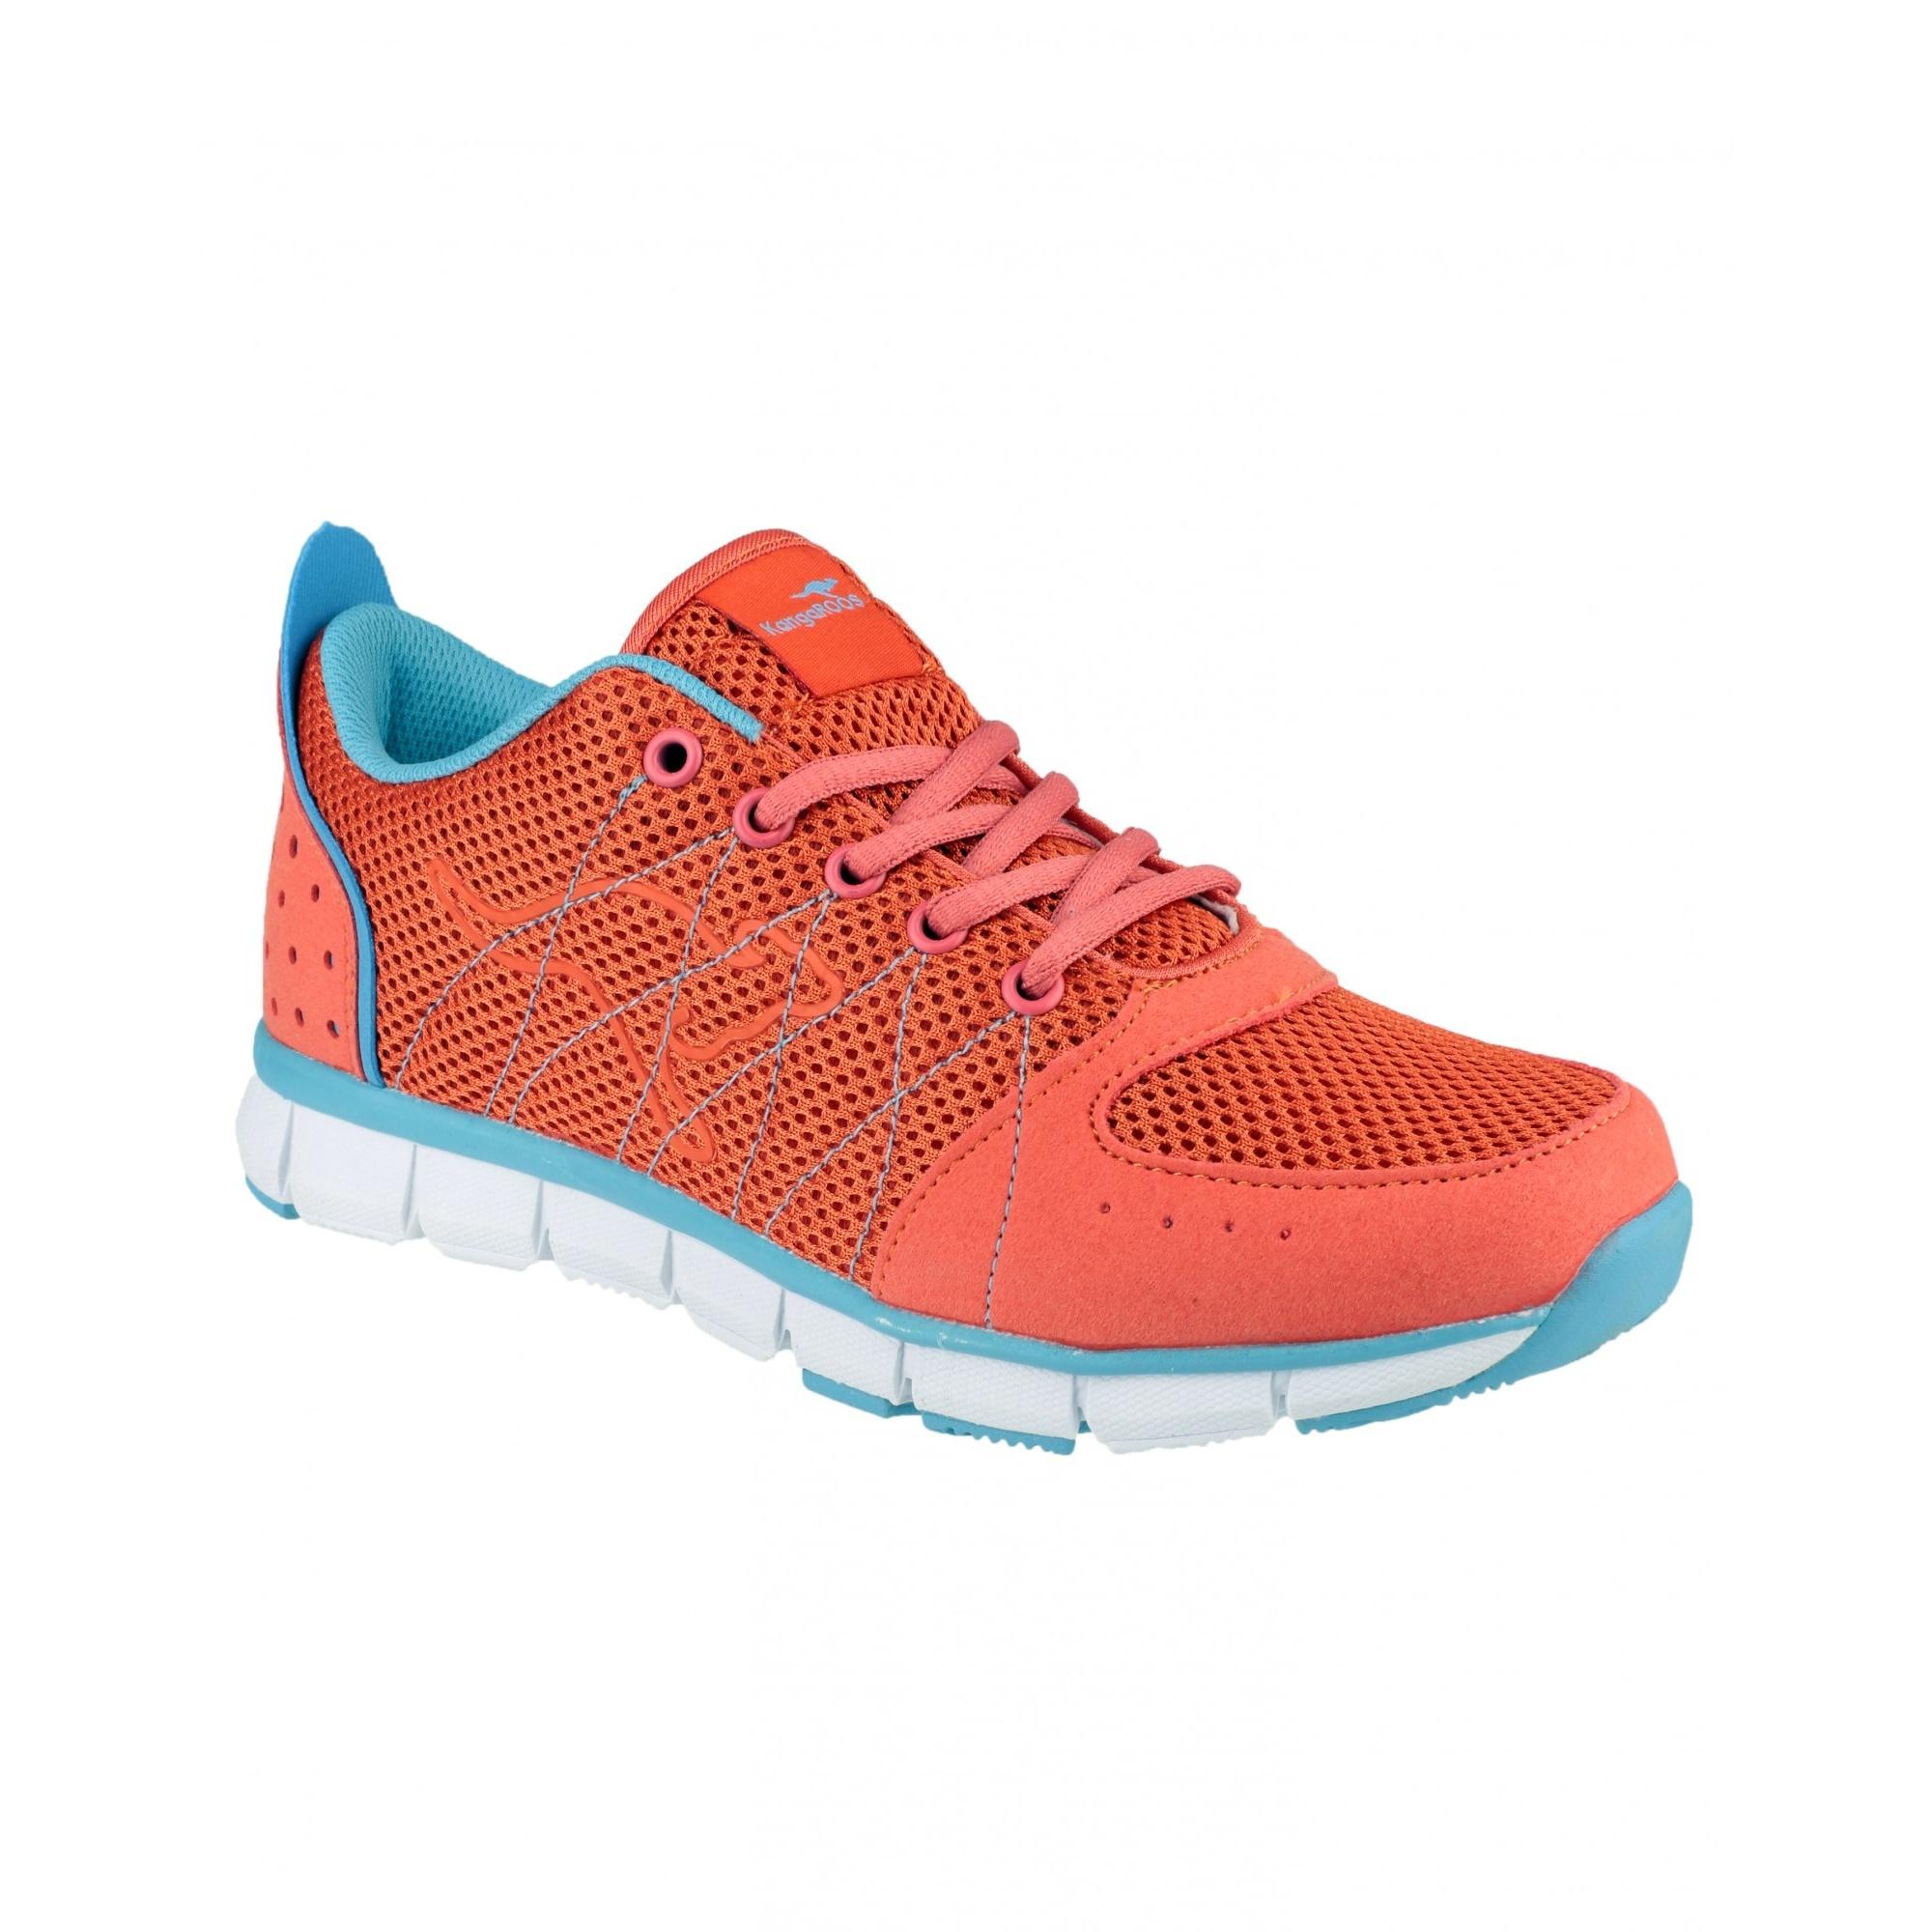 Popular KangaROOS Womenu0026#39;s POCKETPASS JOGGER Shoes | EBay